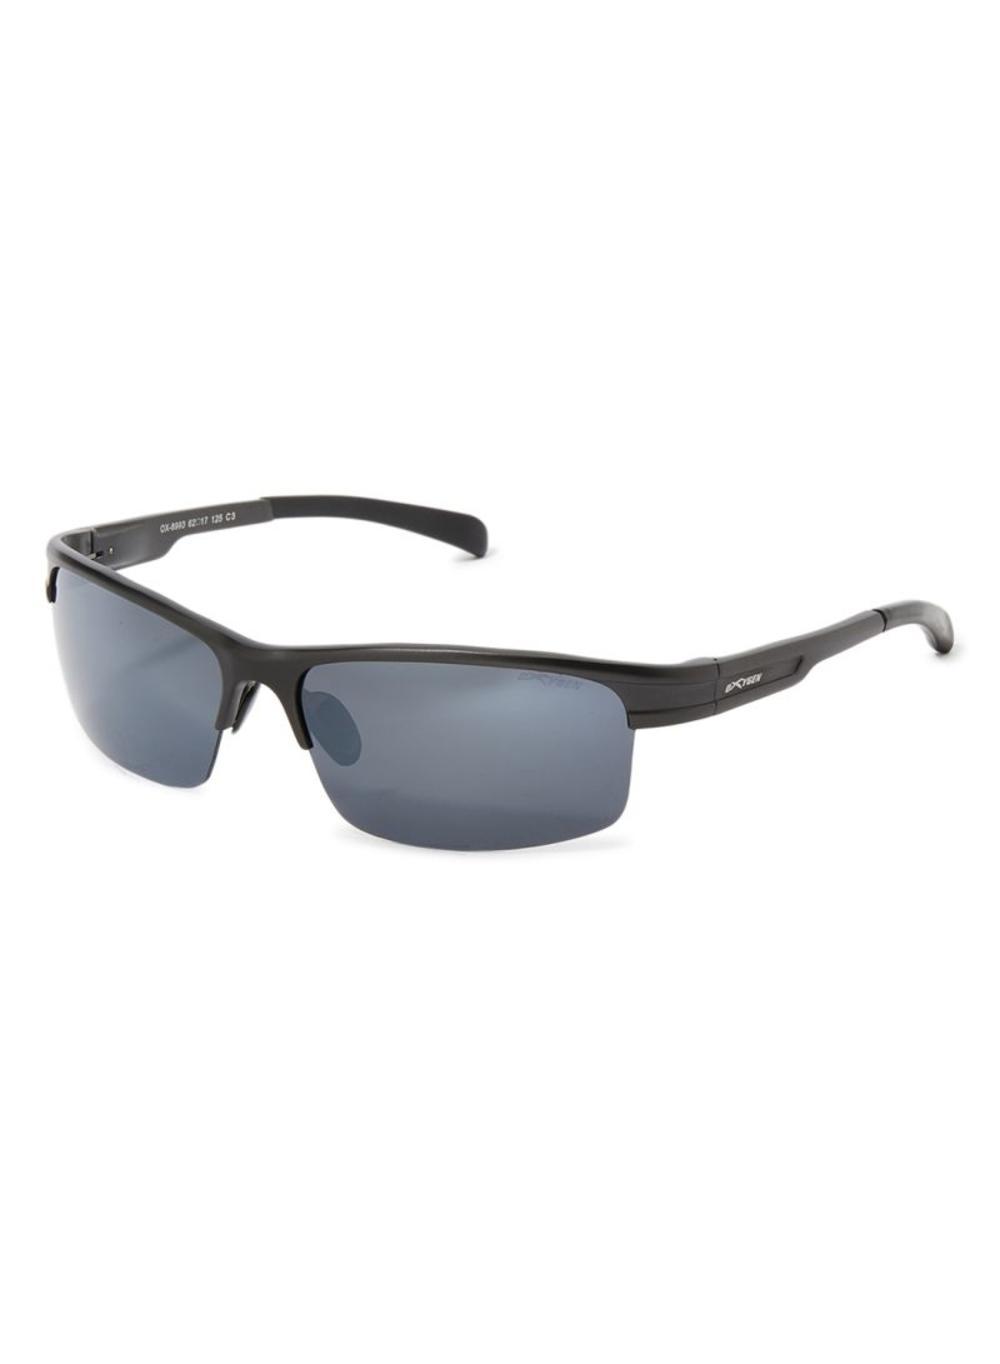 OXYGEN Mens Sports UV Protection Sunglasses OX8993-C3